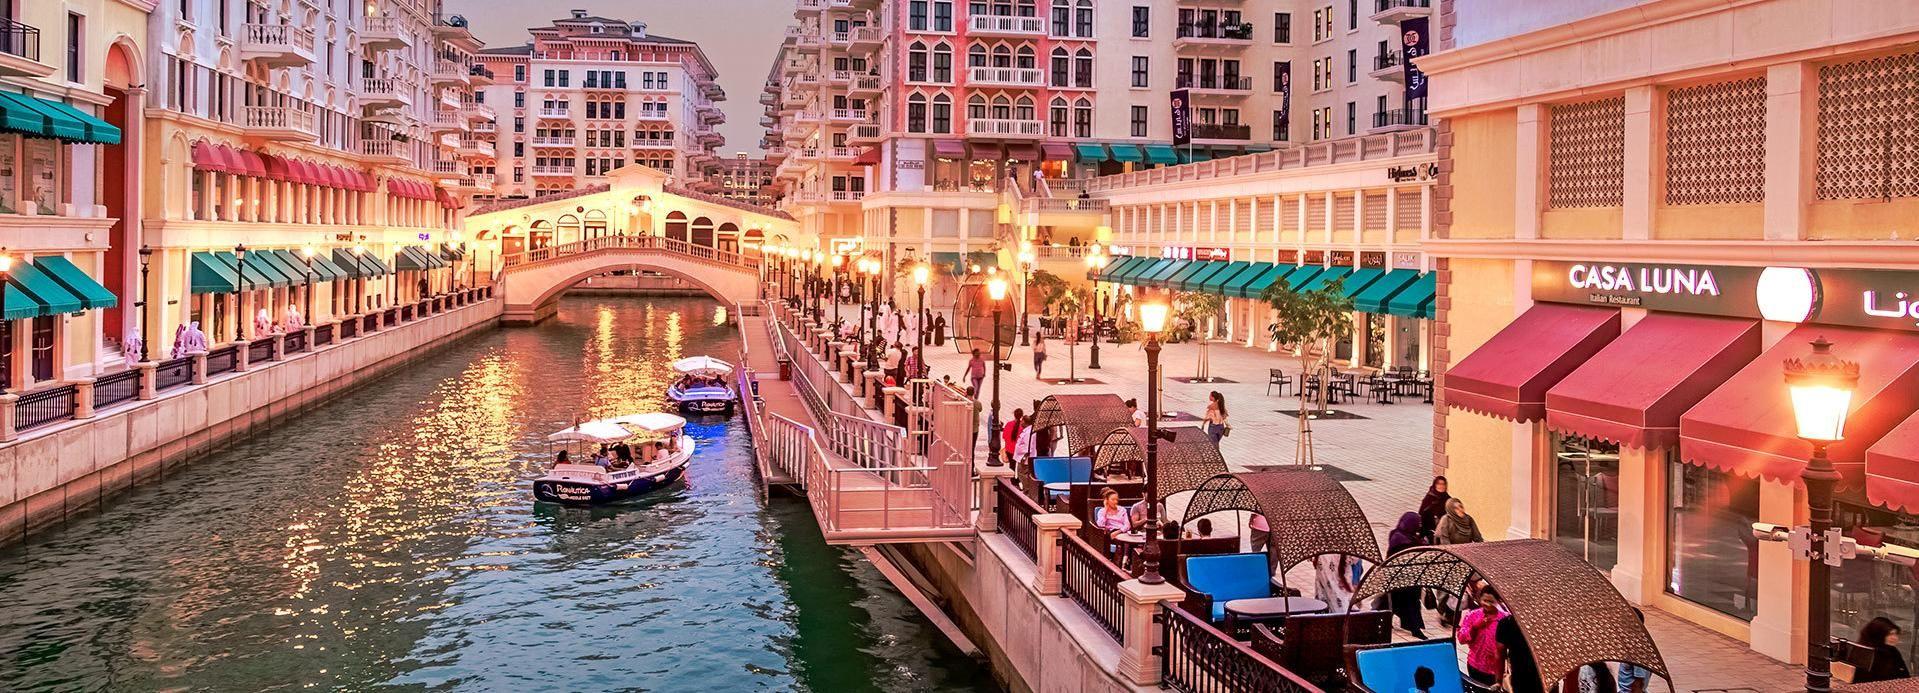 Doha: The Pearl-Qatar Food Tour & Boat Ride